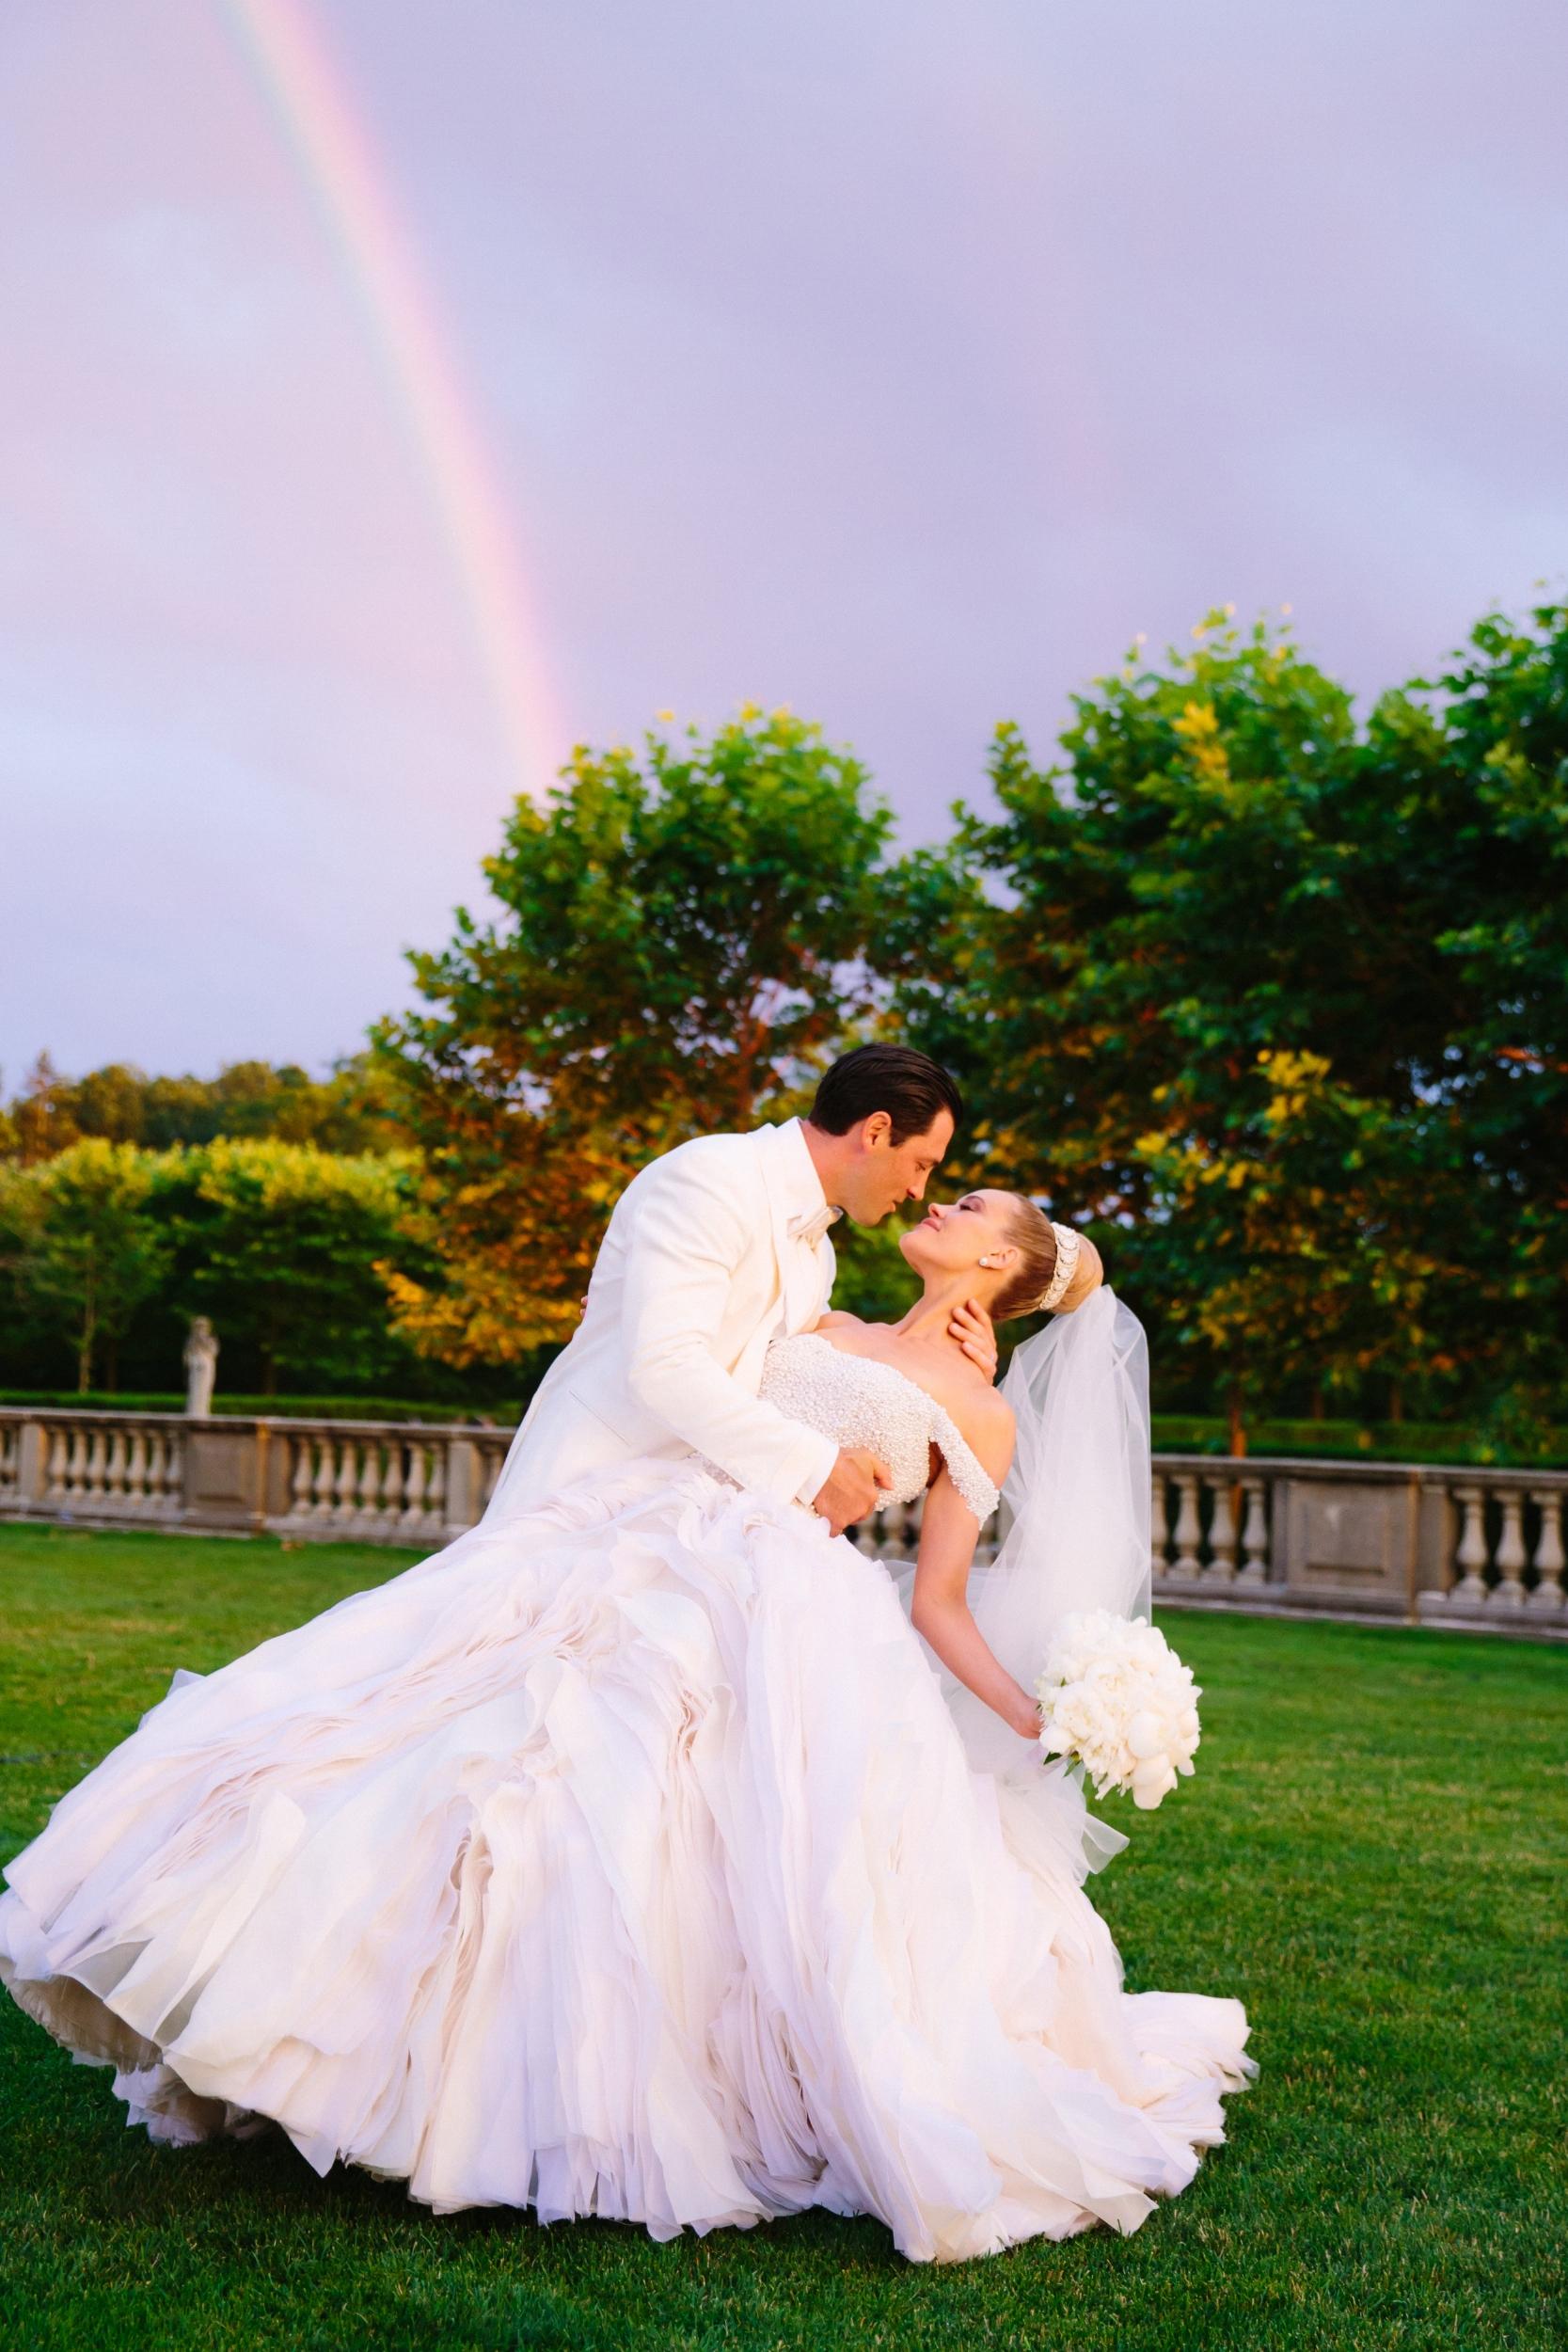 Peta Murgatroyd and Maksim Chmerkovskiy Wedding Jamie Levine Photography Oheka Castle 001.jpg